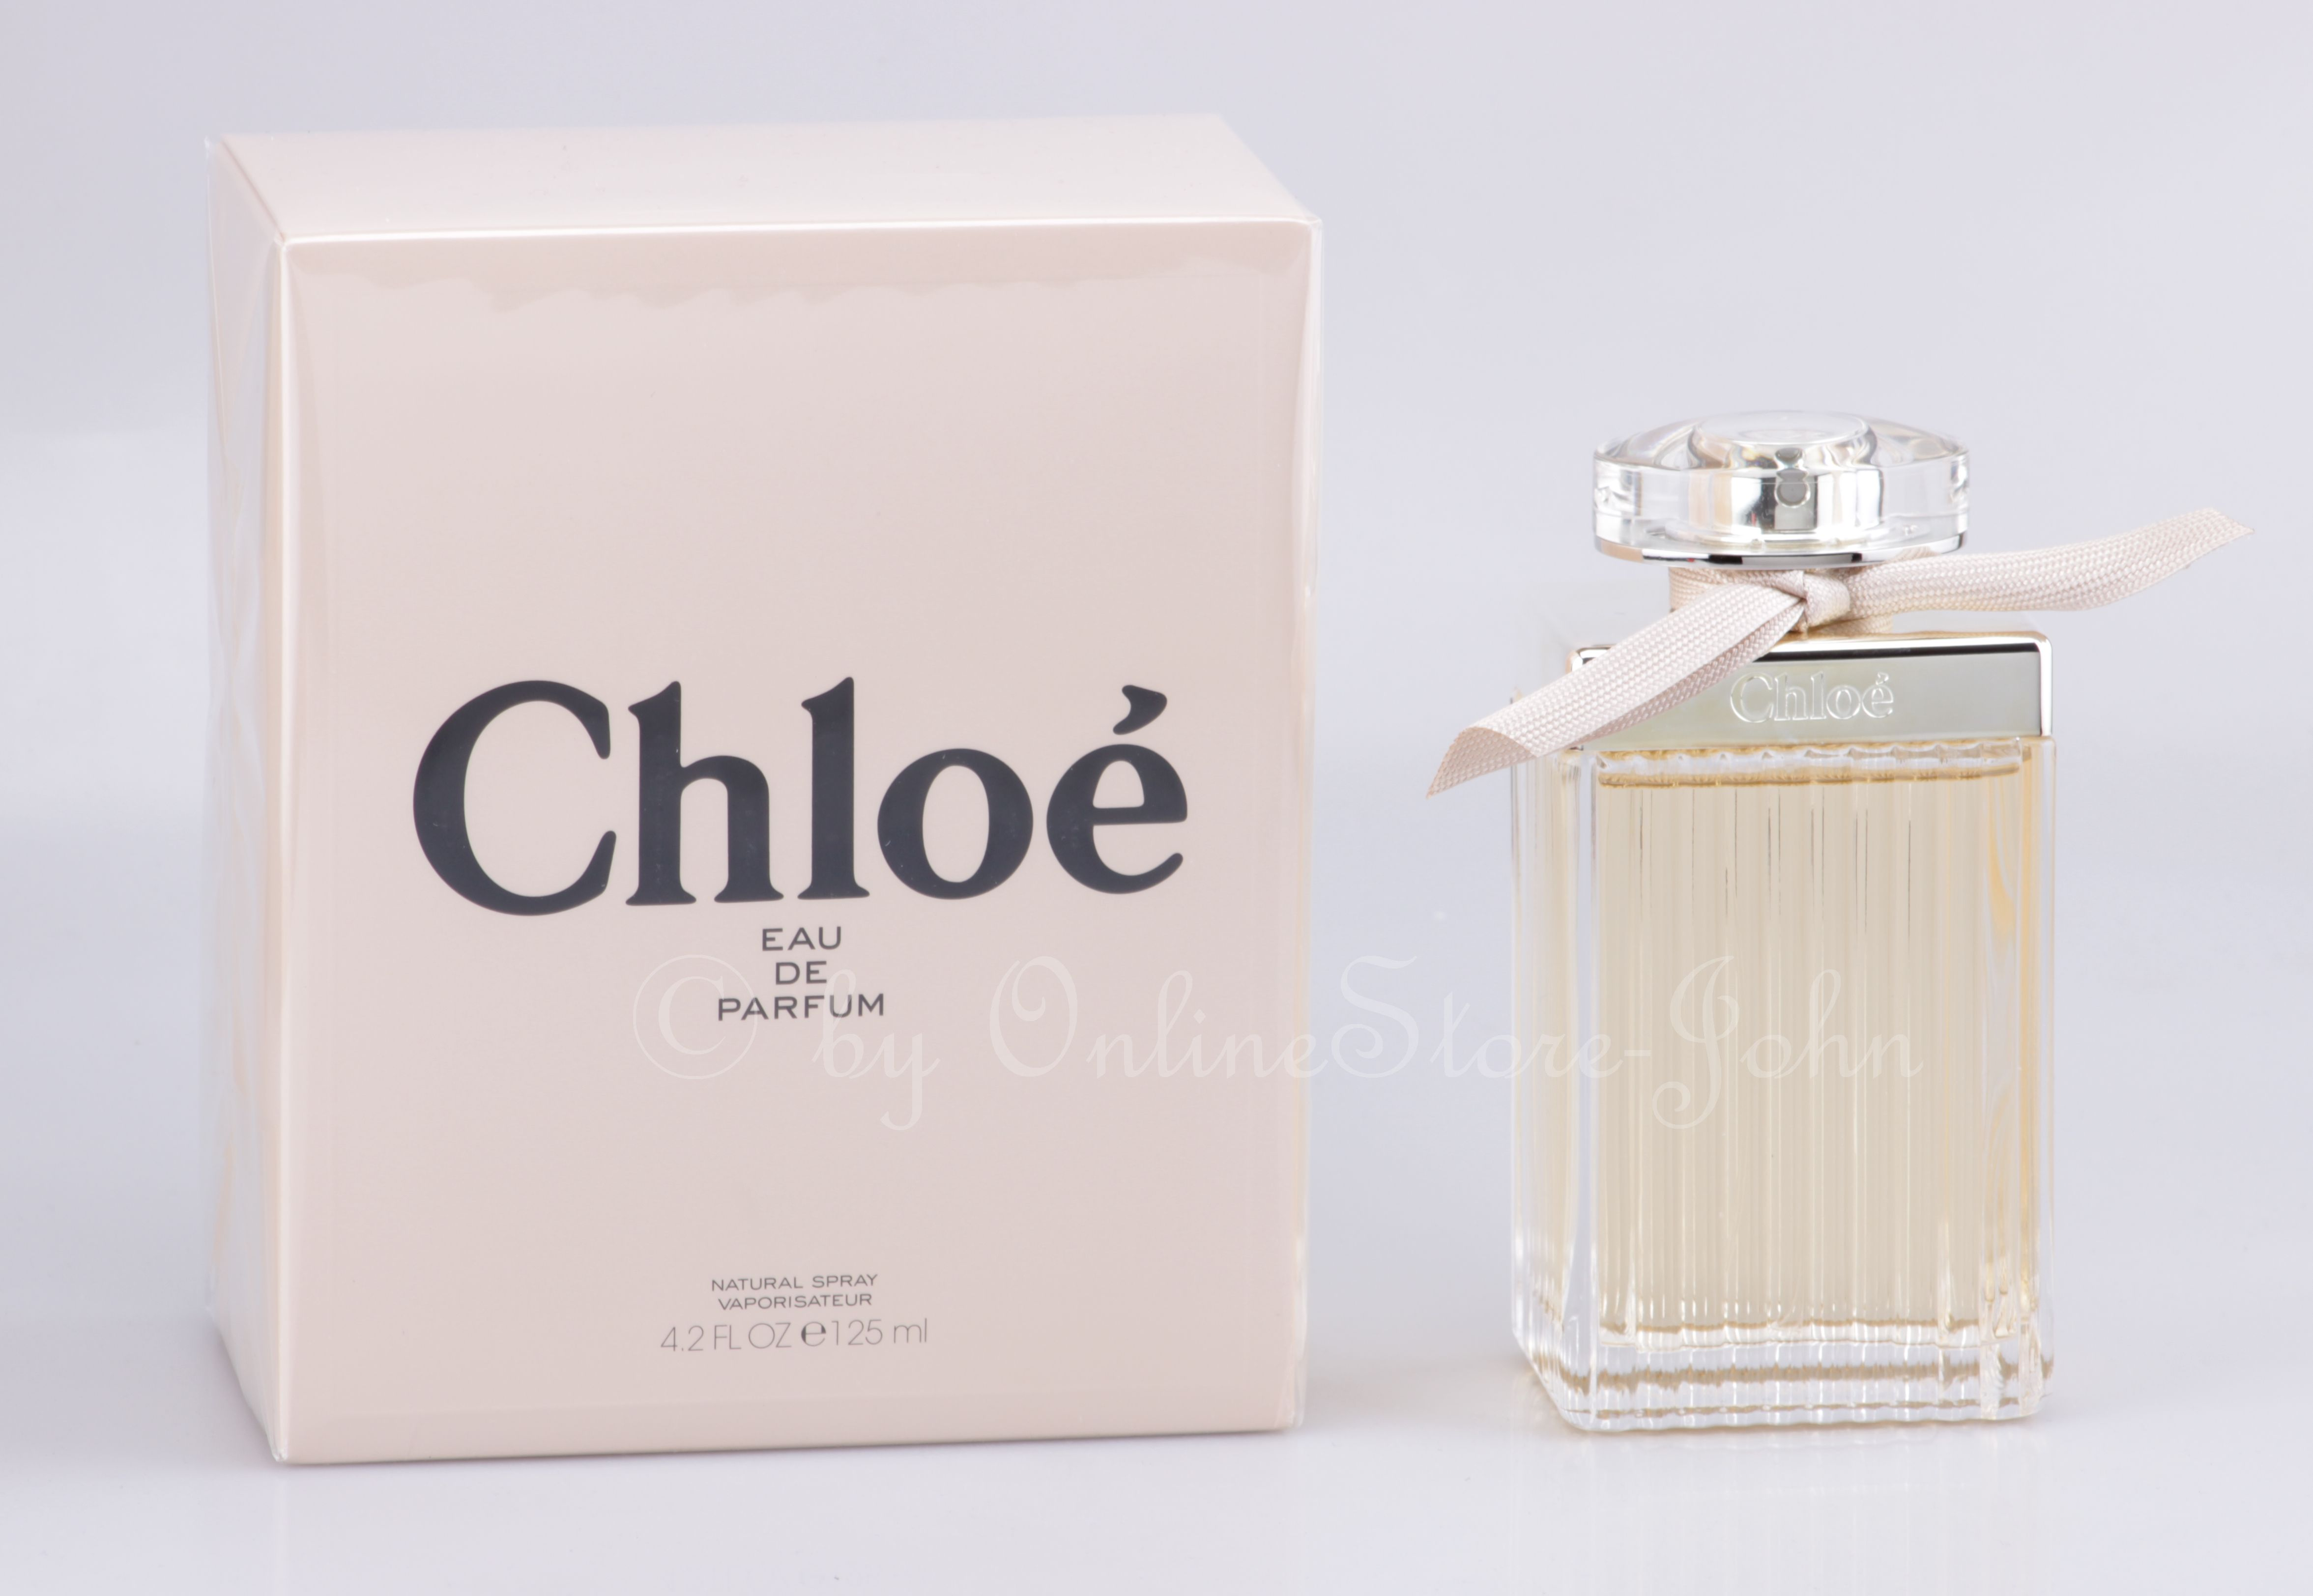 Chloe Signature 125ml Eau de Parfum Sprayflasche günstig